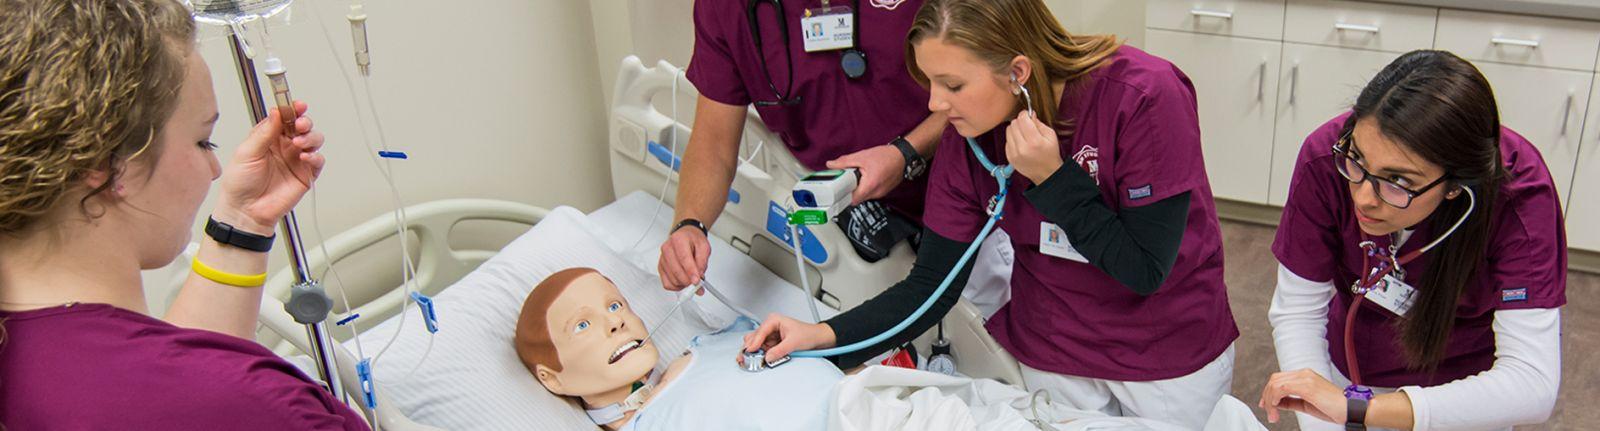 nursing students and medical dummy